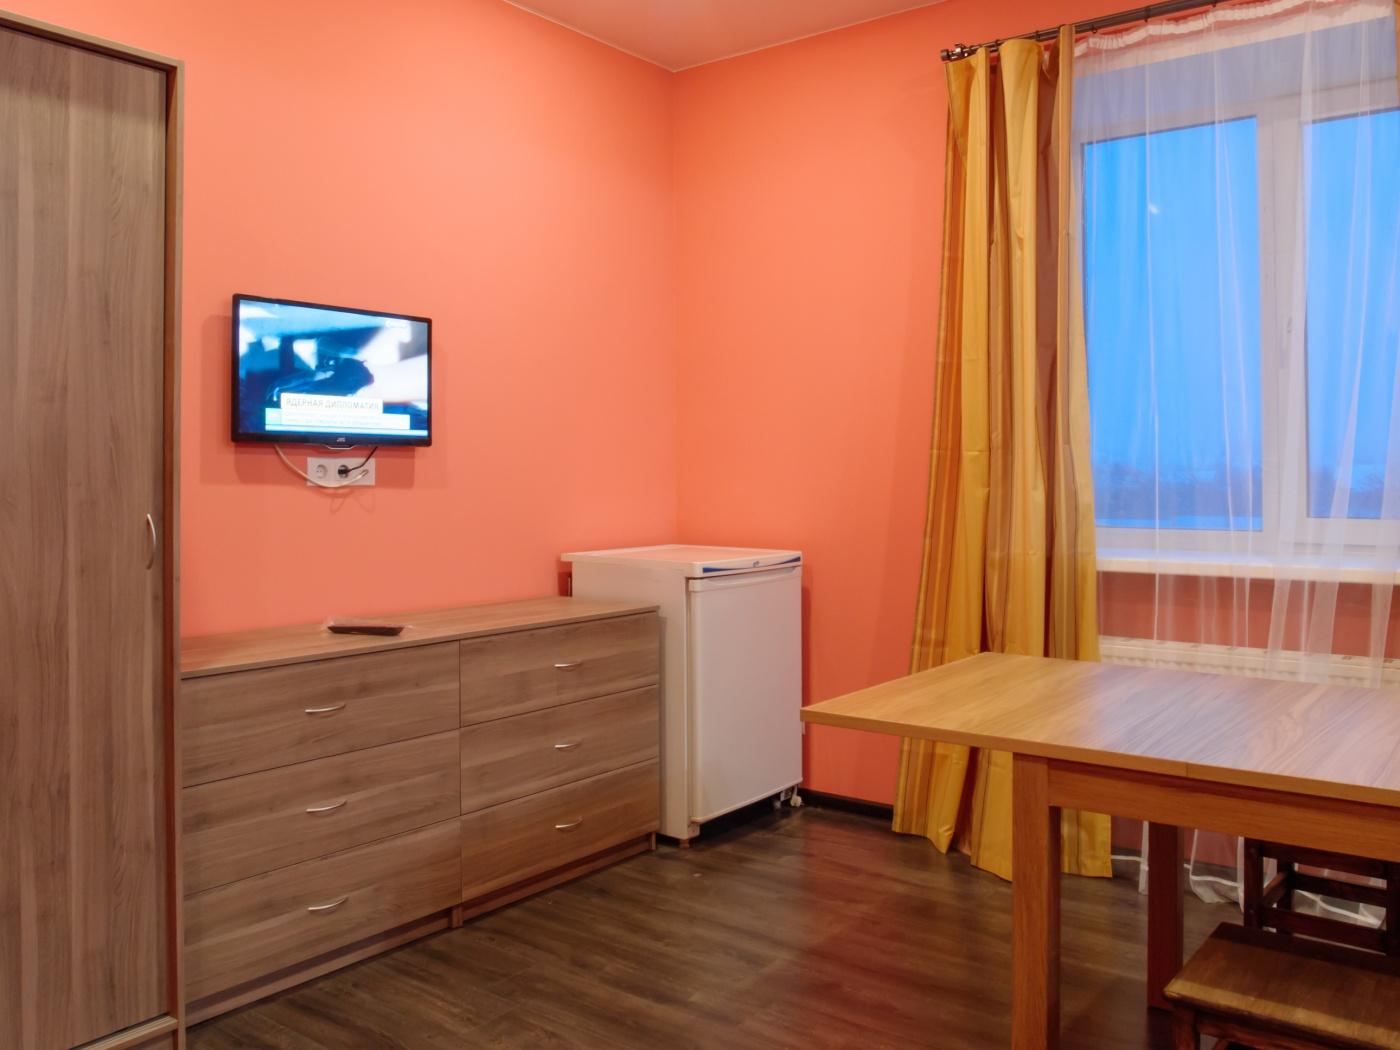 База отдыха «Marlin-KZN» Республика Татарстан Номер на втором этаже, фото 4